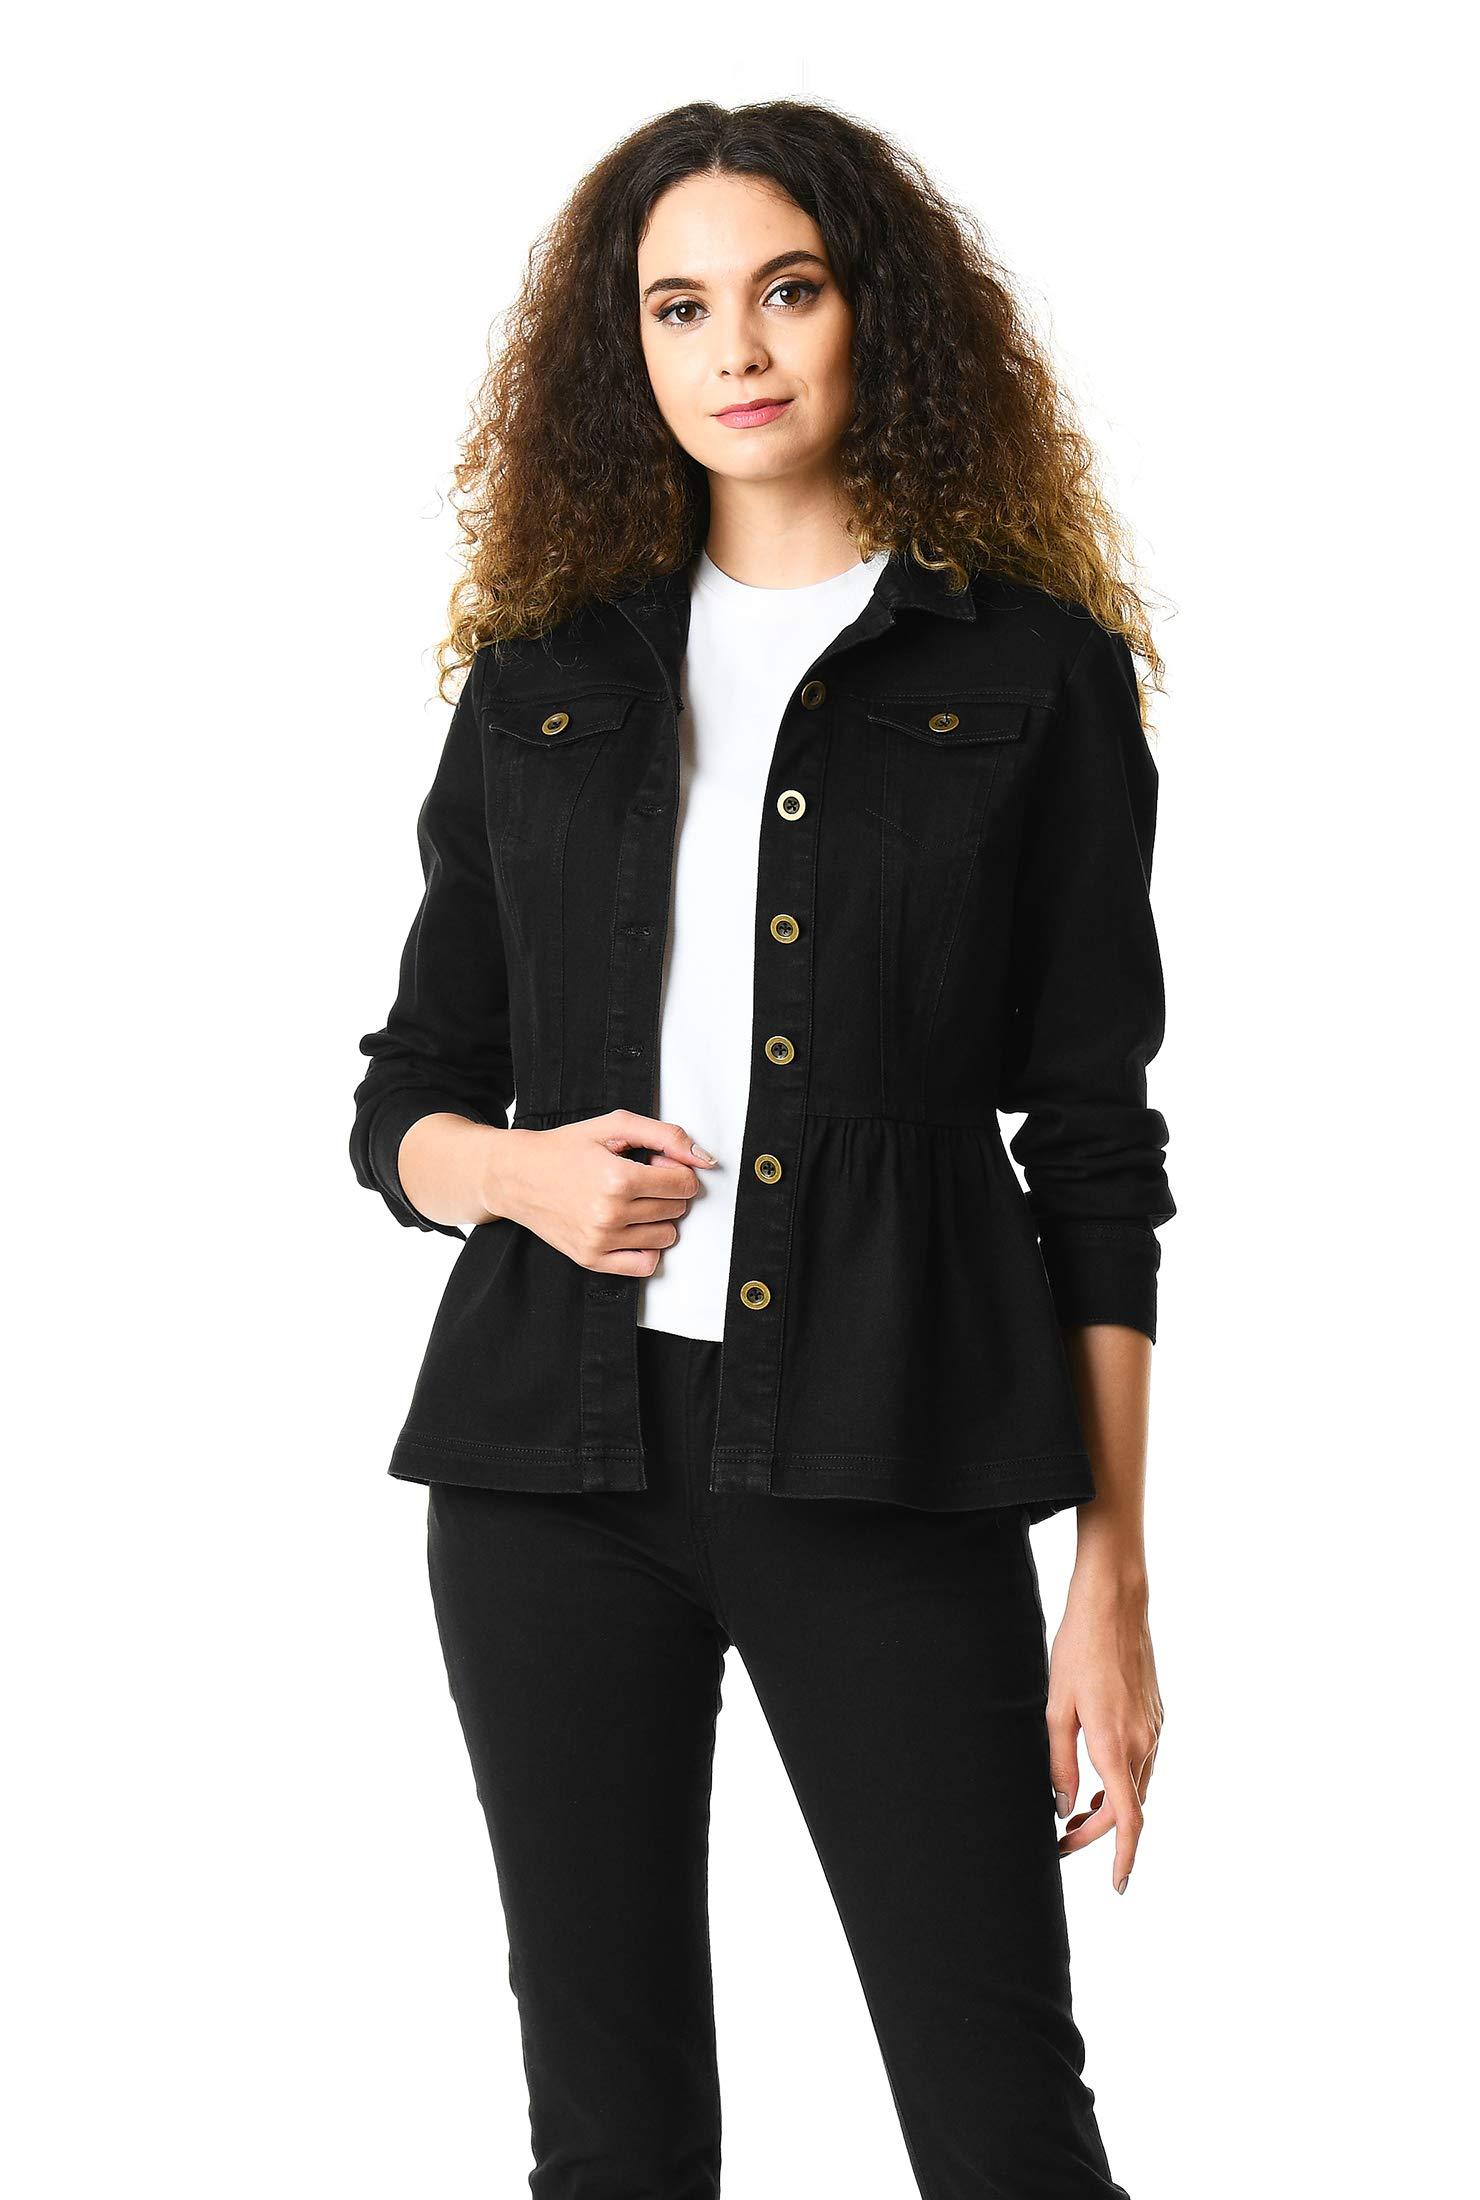 eShakti Women's Black Denim Peplum Jacket XS-0 Short Black